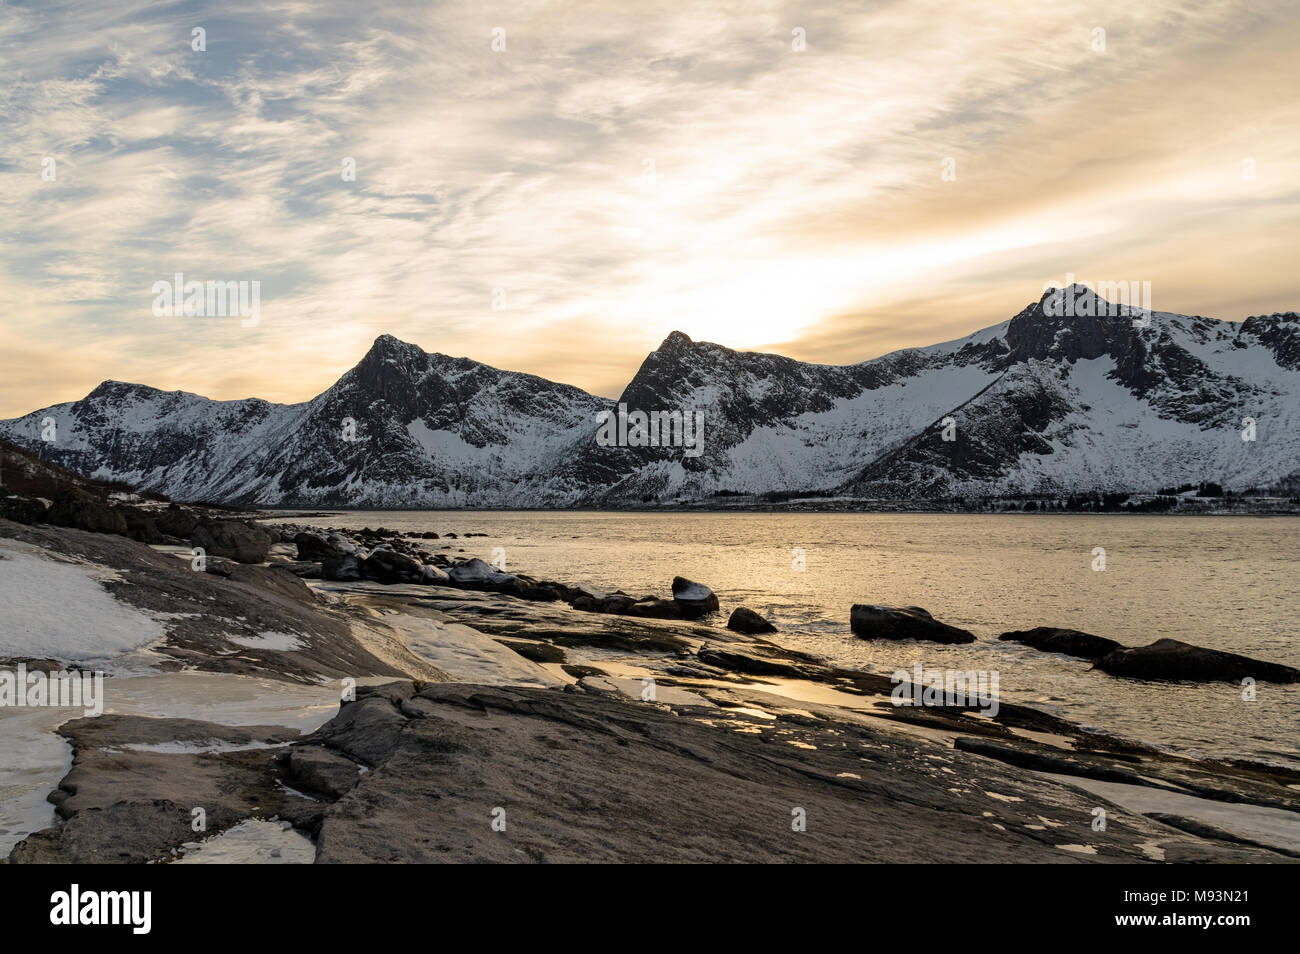 Winter scenery of Senja in Norway - Stock Image